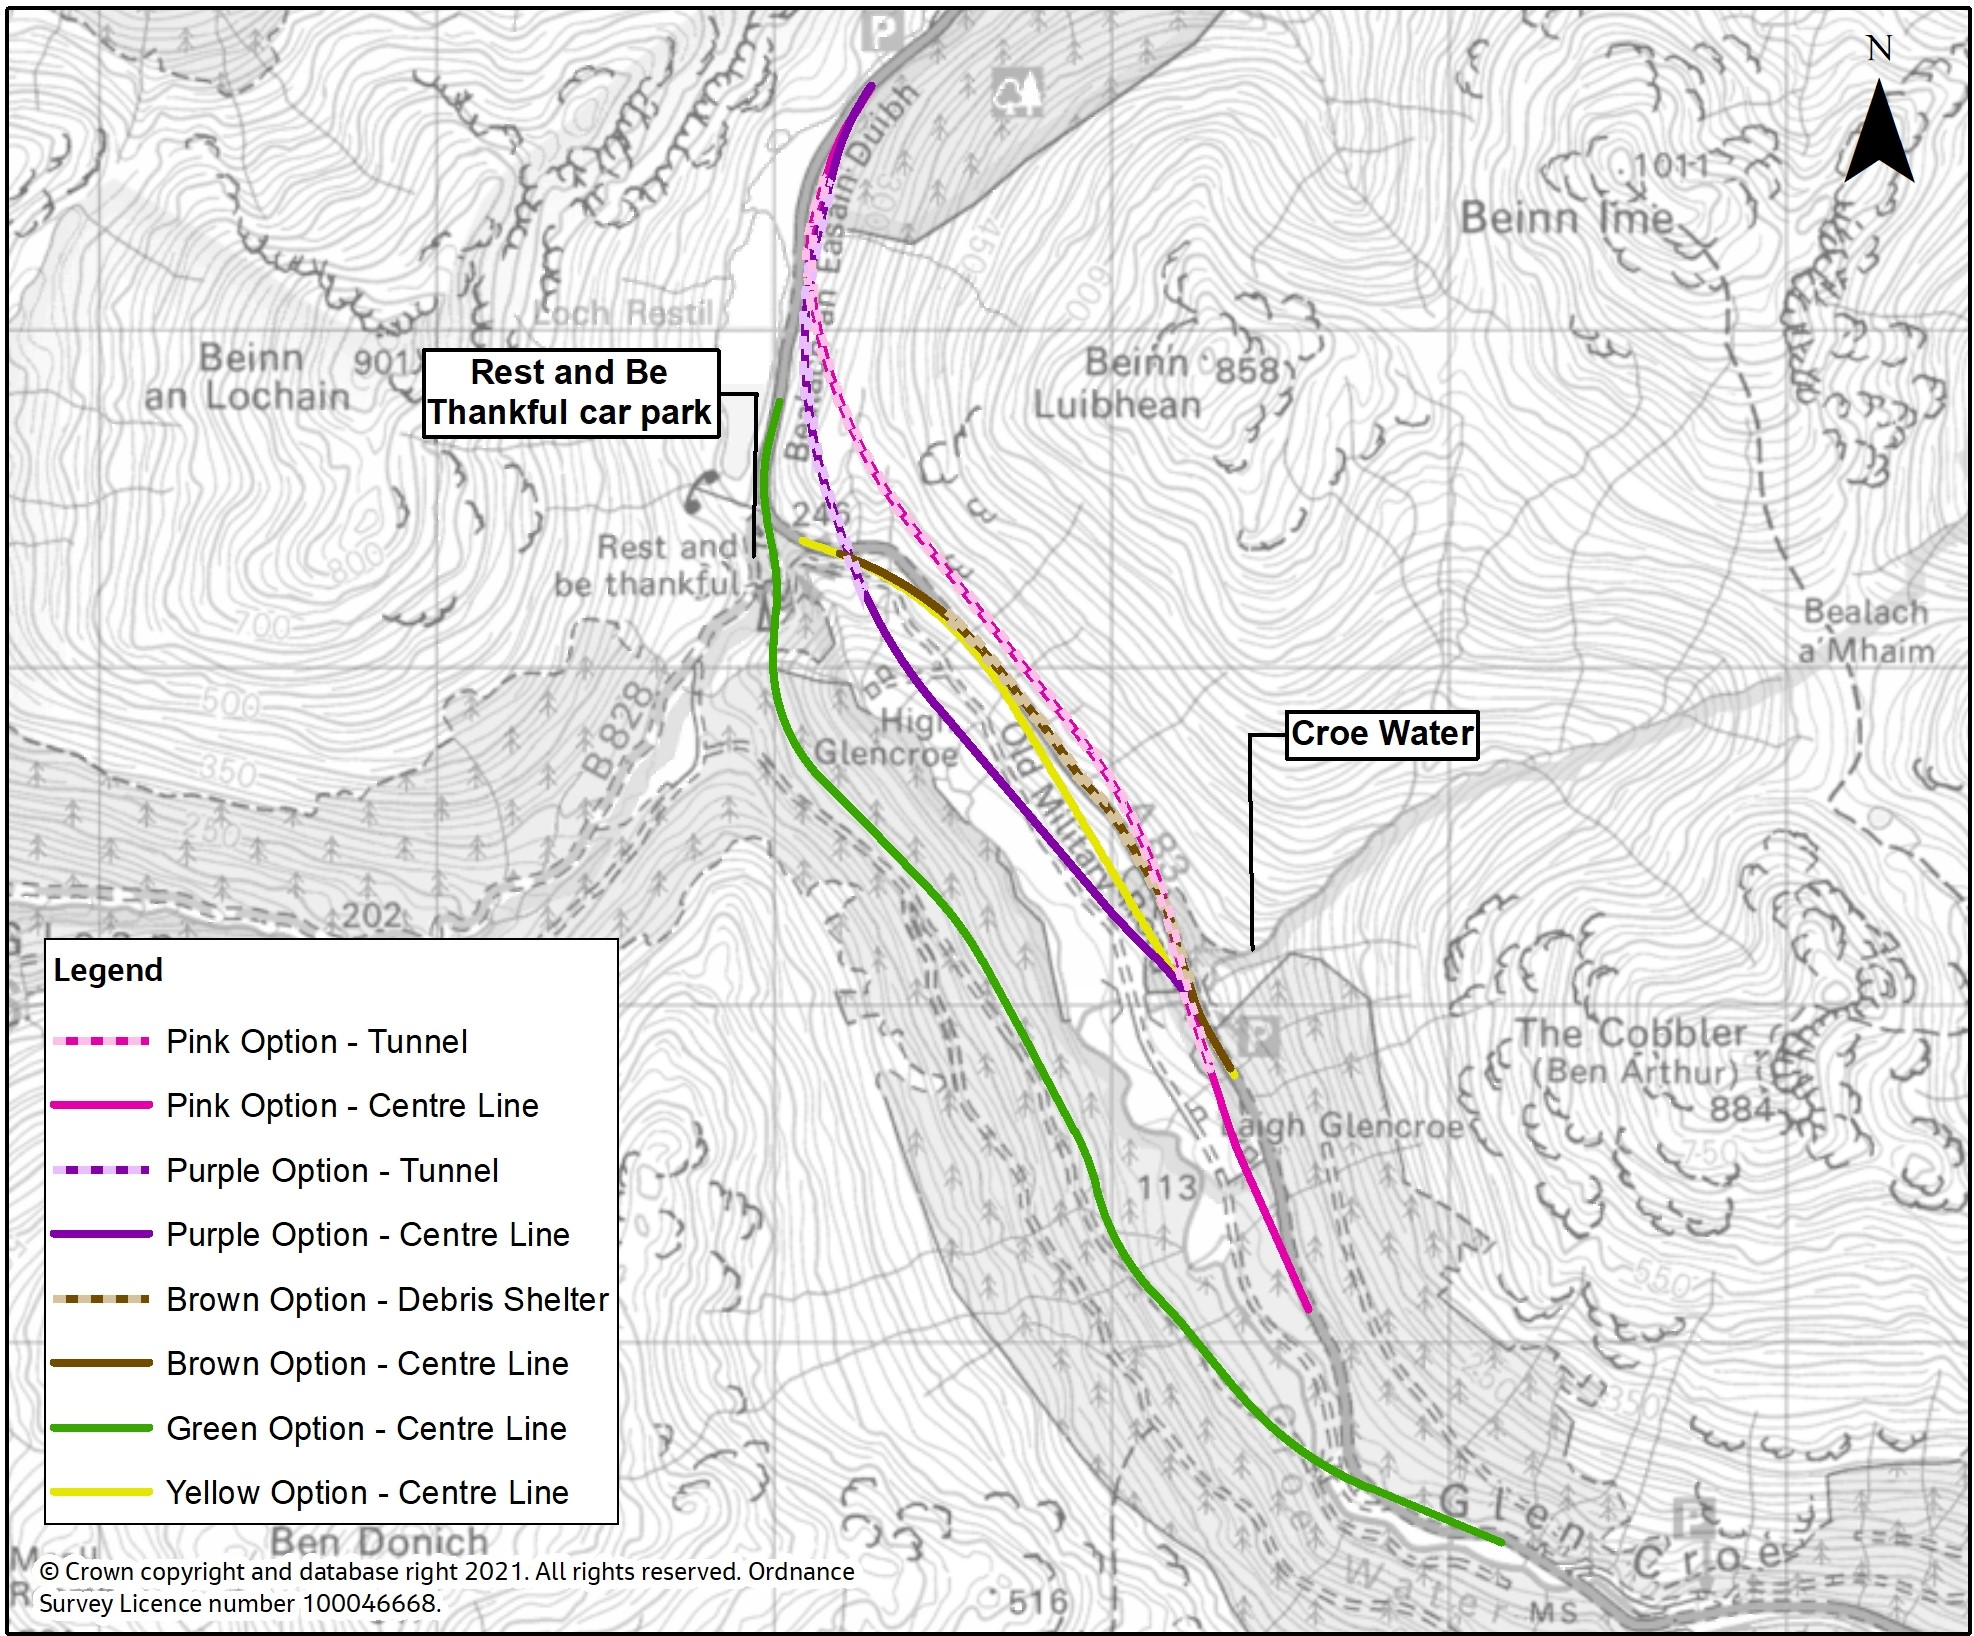 Preferred A83 route identified